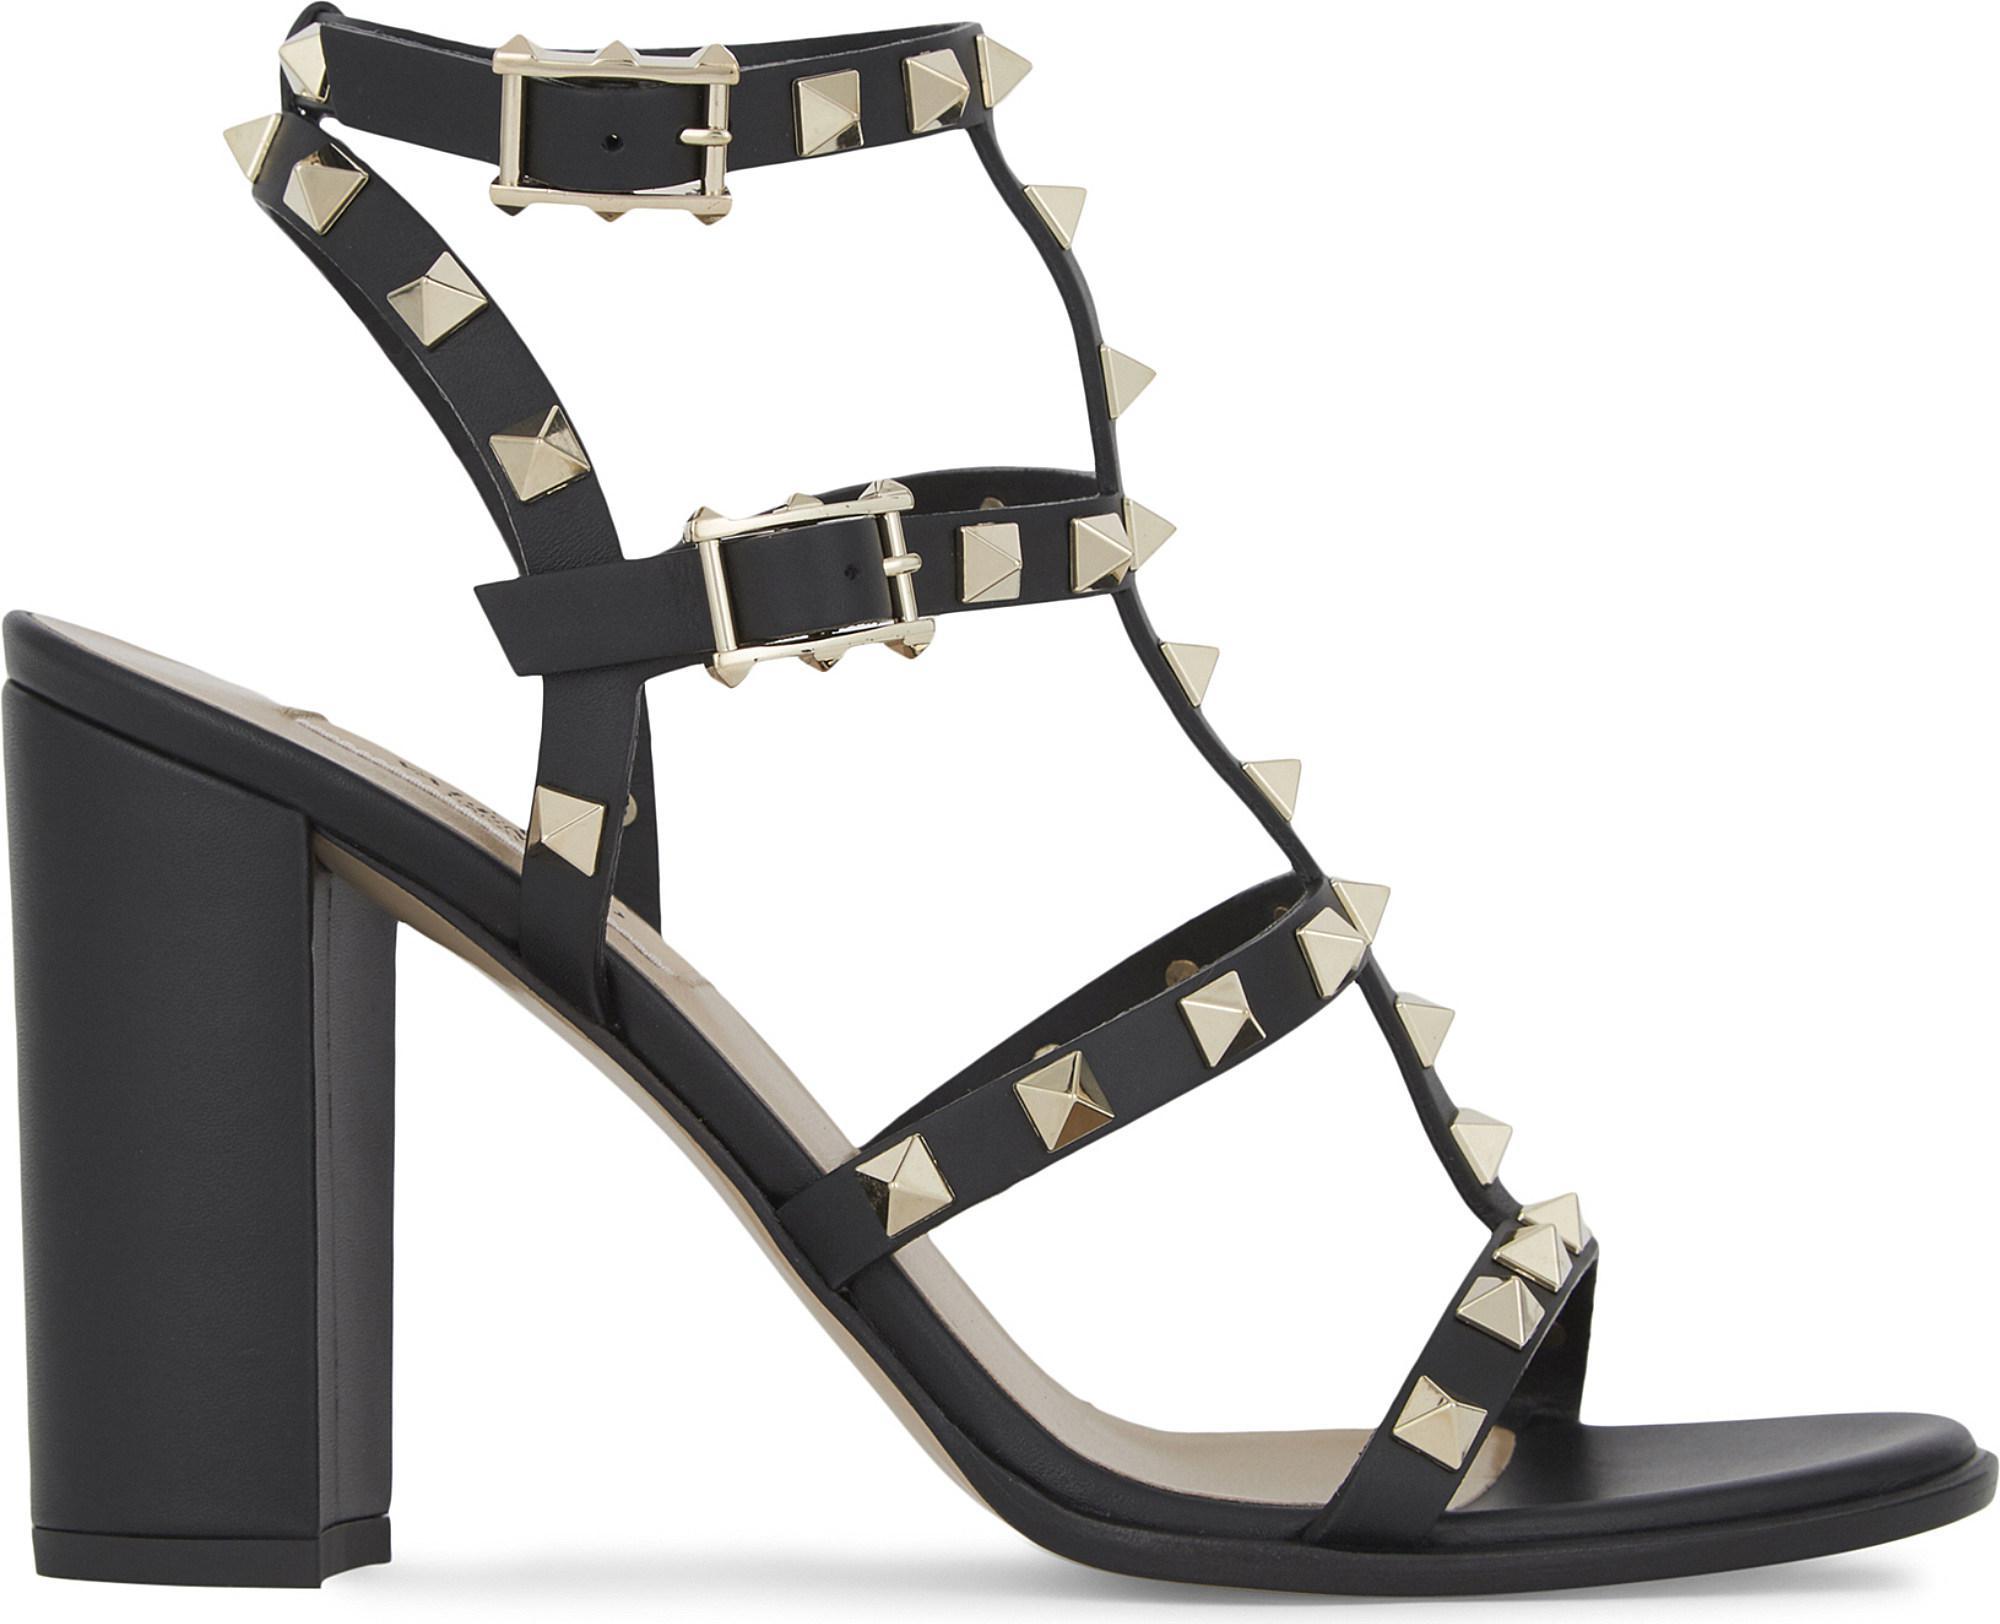 9cf901c2cb92f Lyst - Valentino Rockstud 90 Leather Heeled Sandals in Black - Save 22%